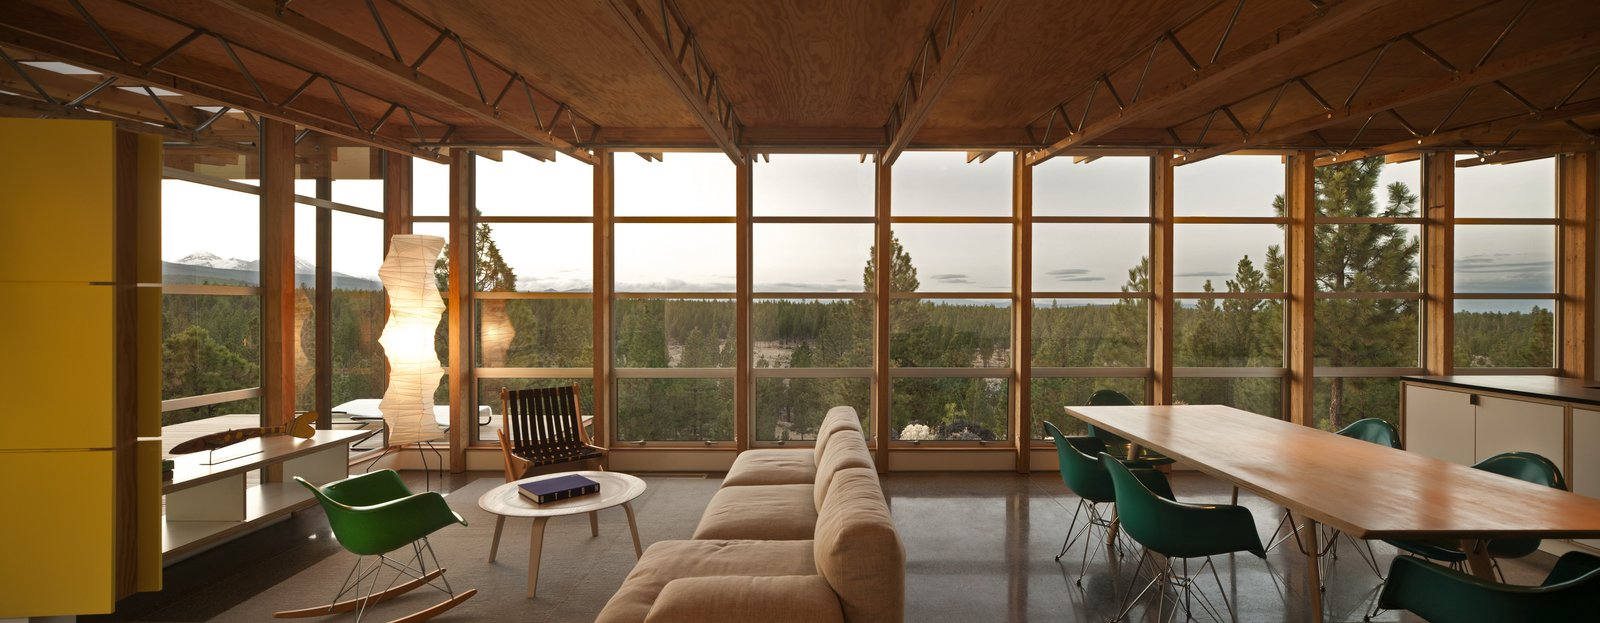 Skyline Residence by Bohlin Cywinski Jackson